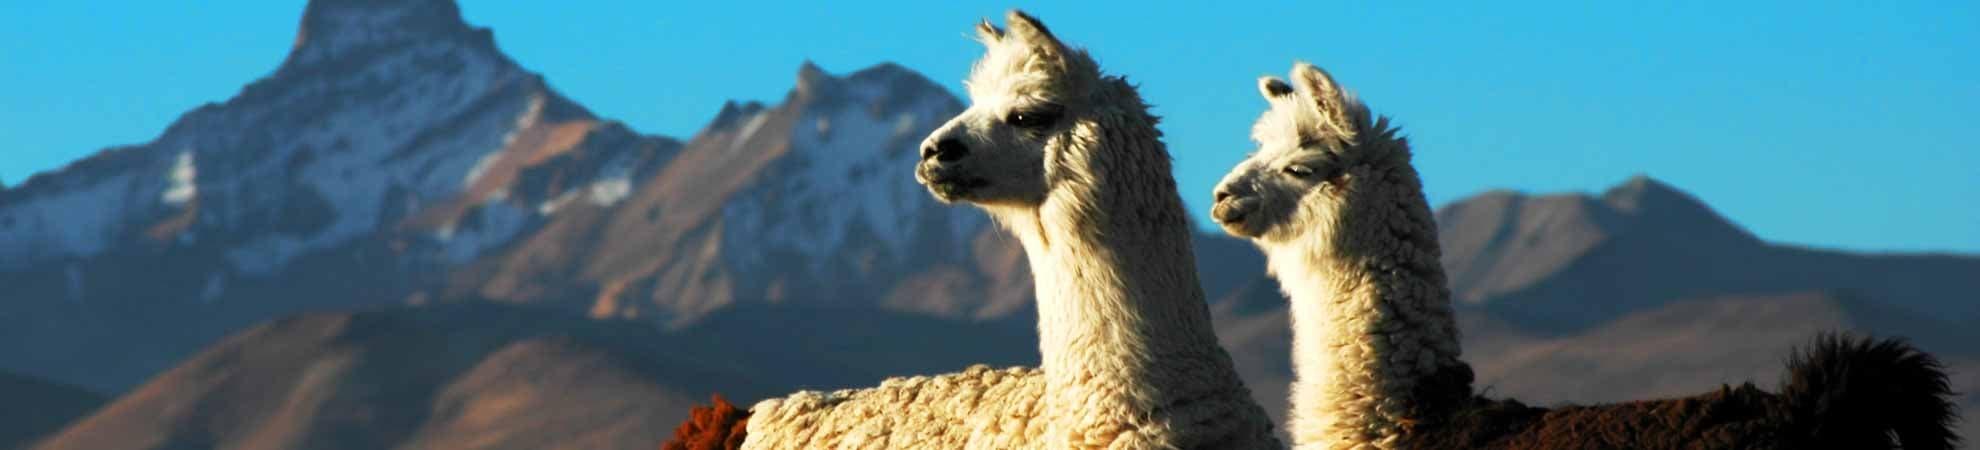 Séjour Pérou